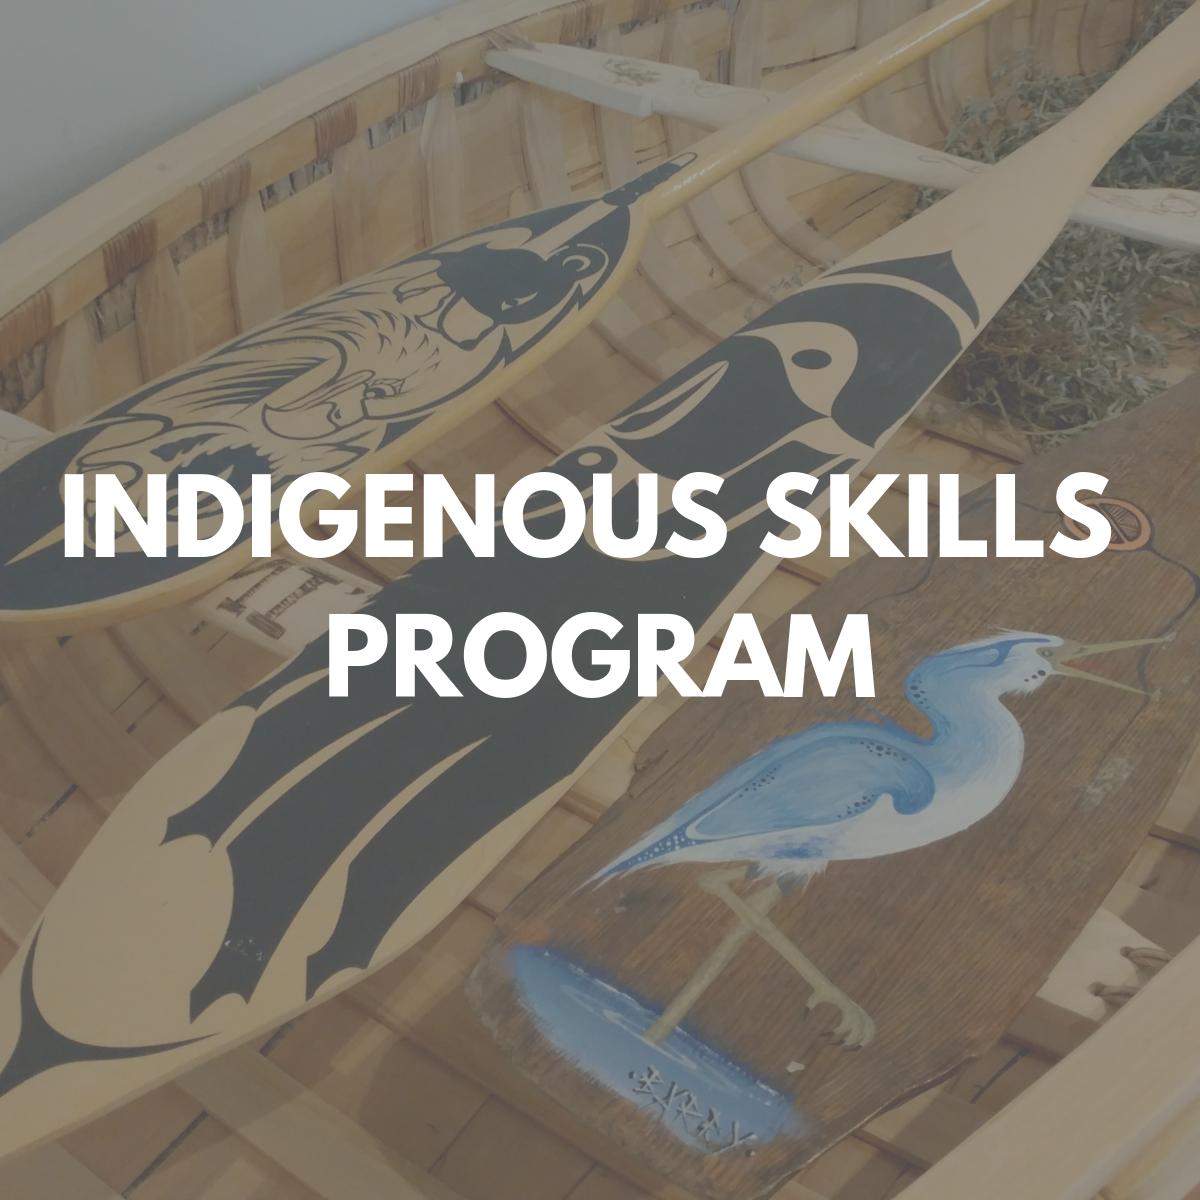 Indigenous Skills Program